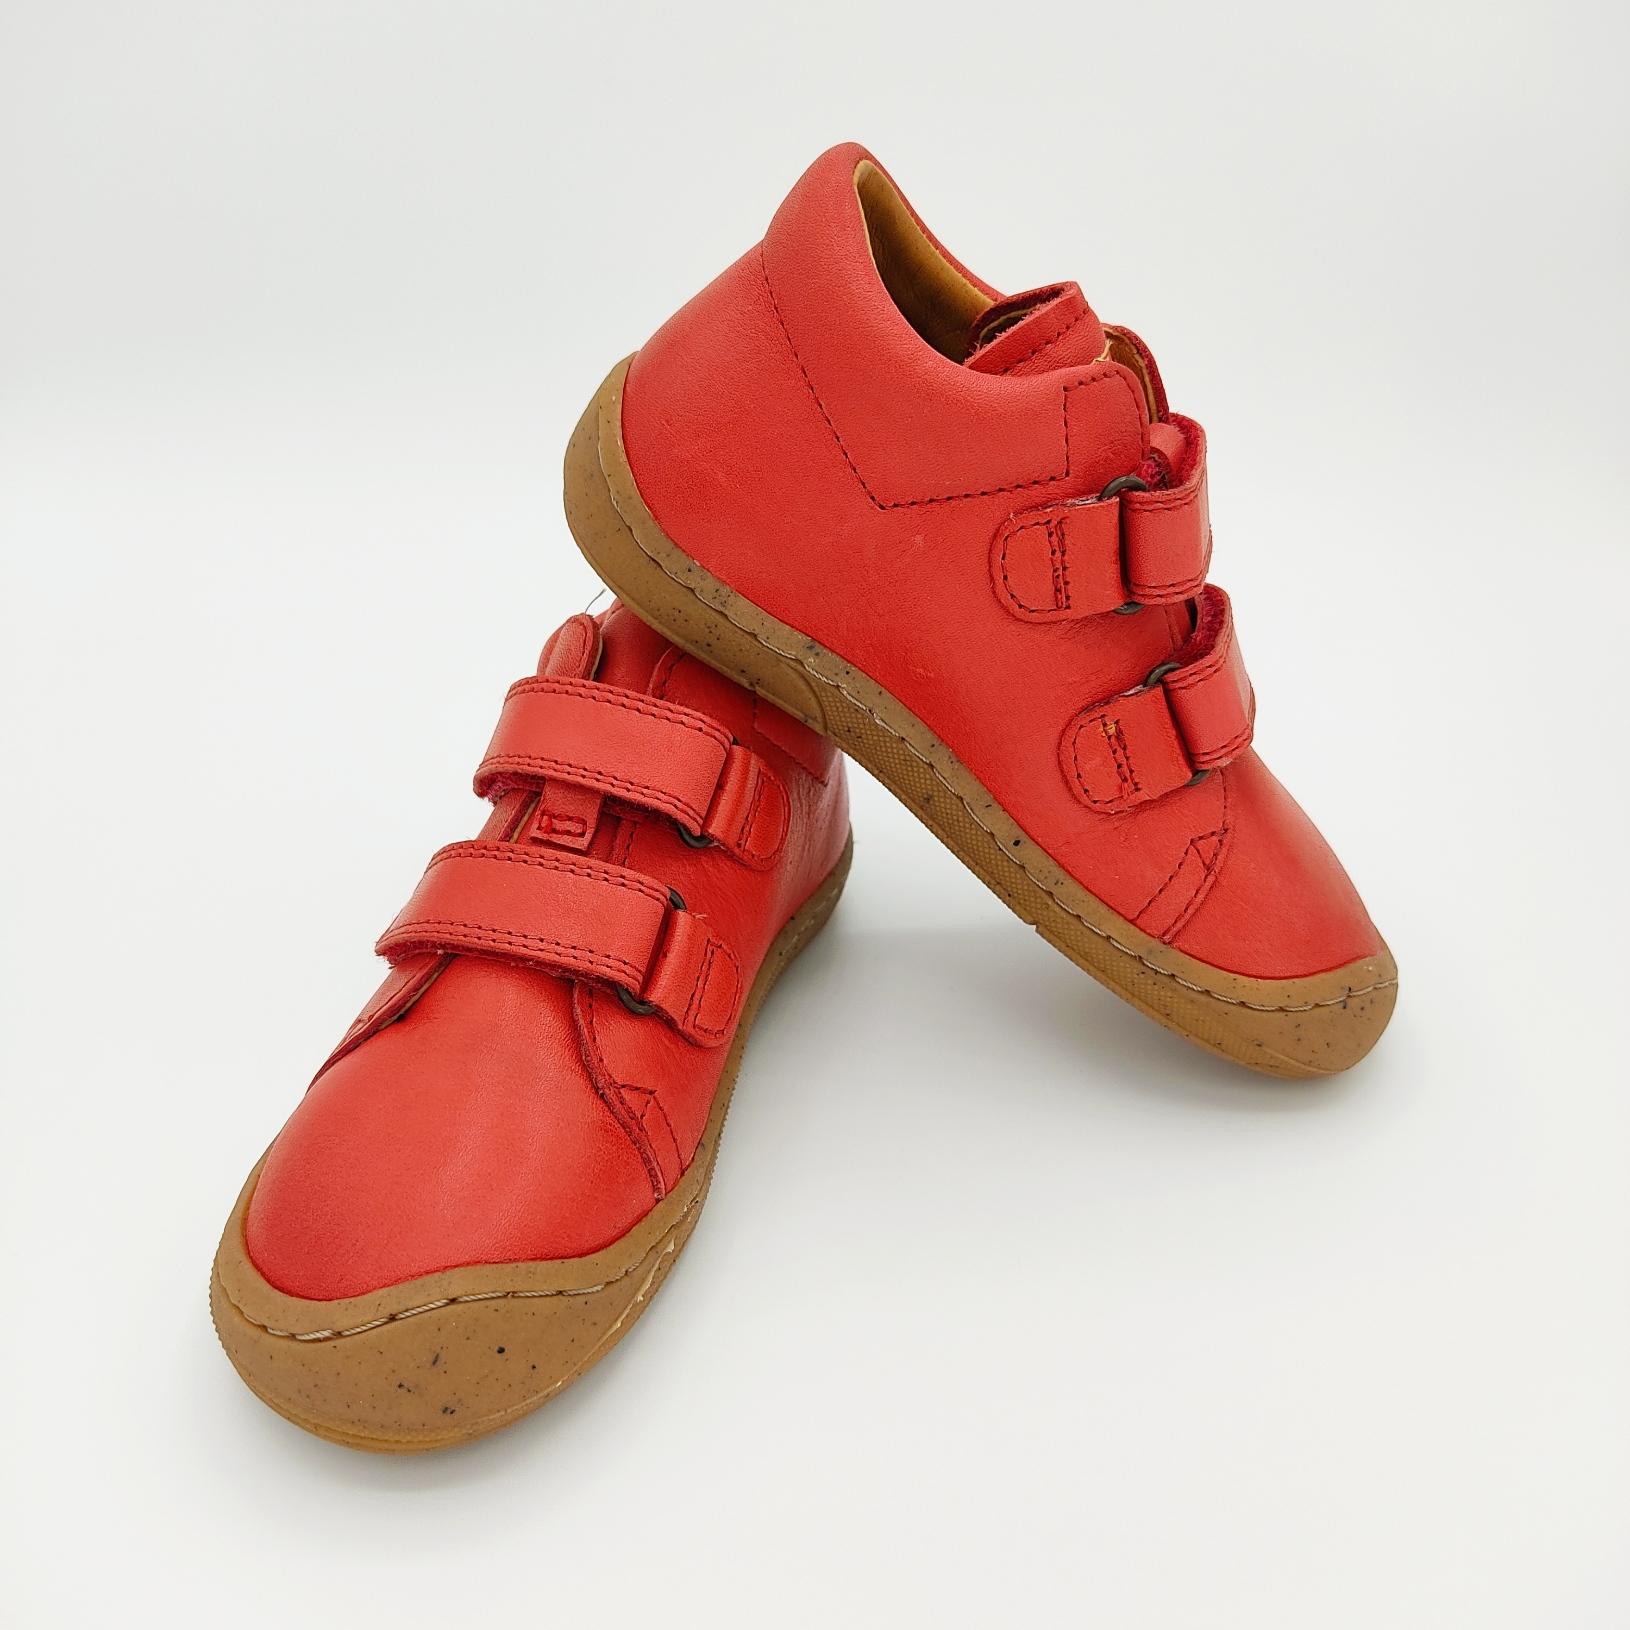 Chaussures MINNI VELCRO Froddo Flexible - red